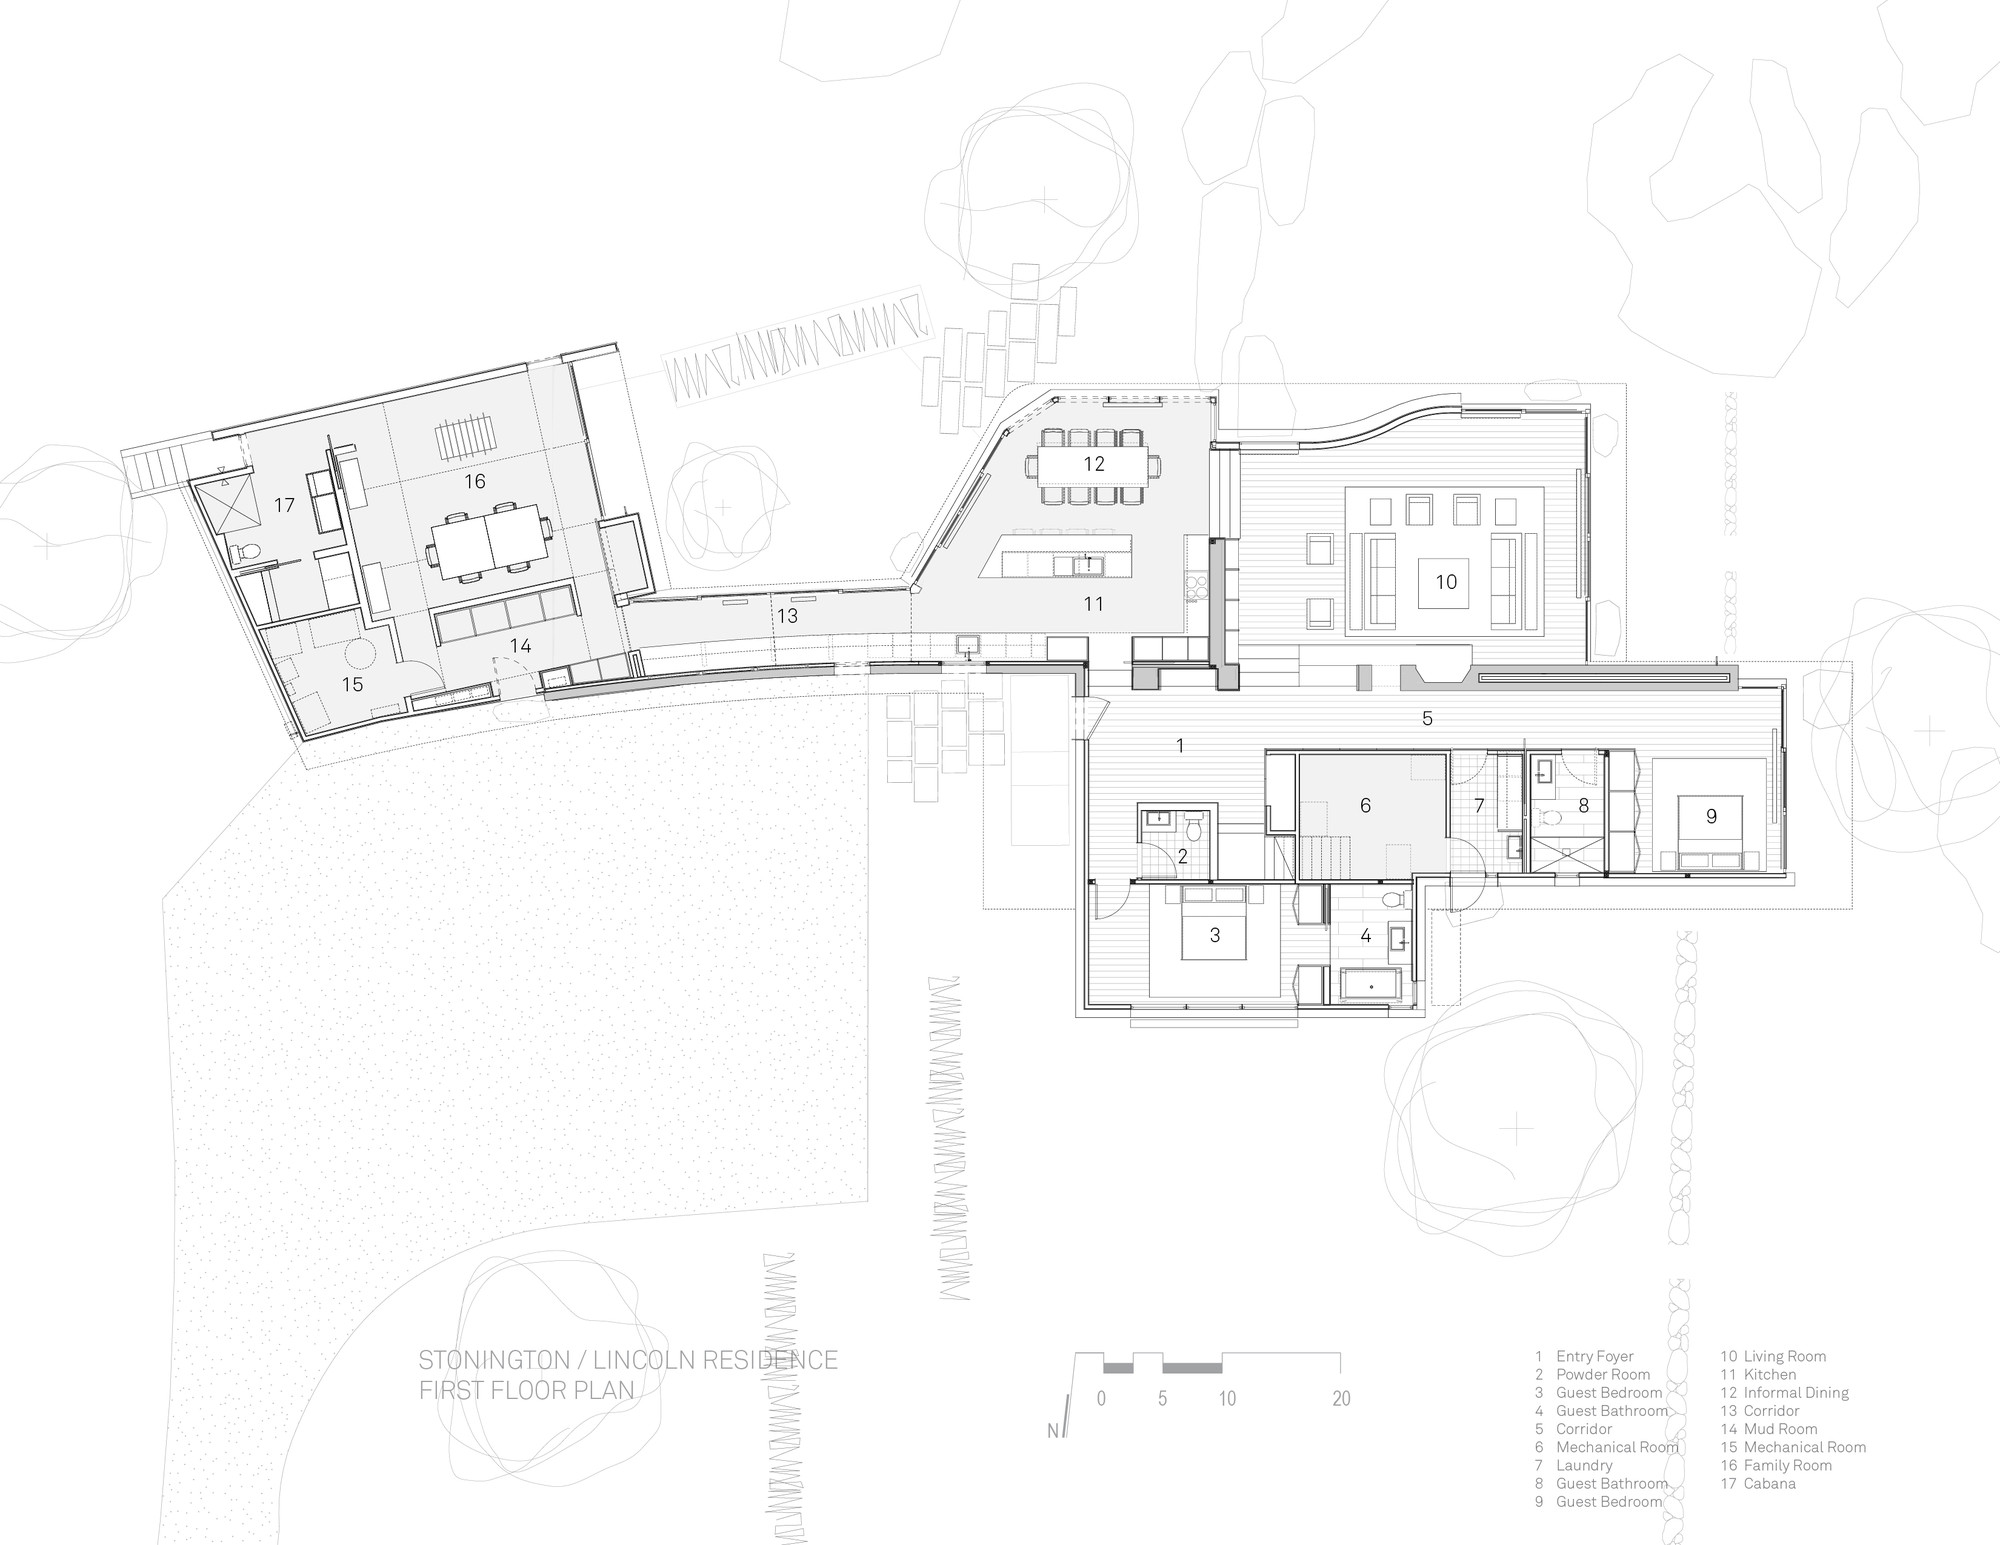 stonington residence joeb moore partners archdaily first floor plan